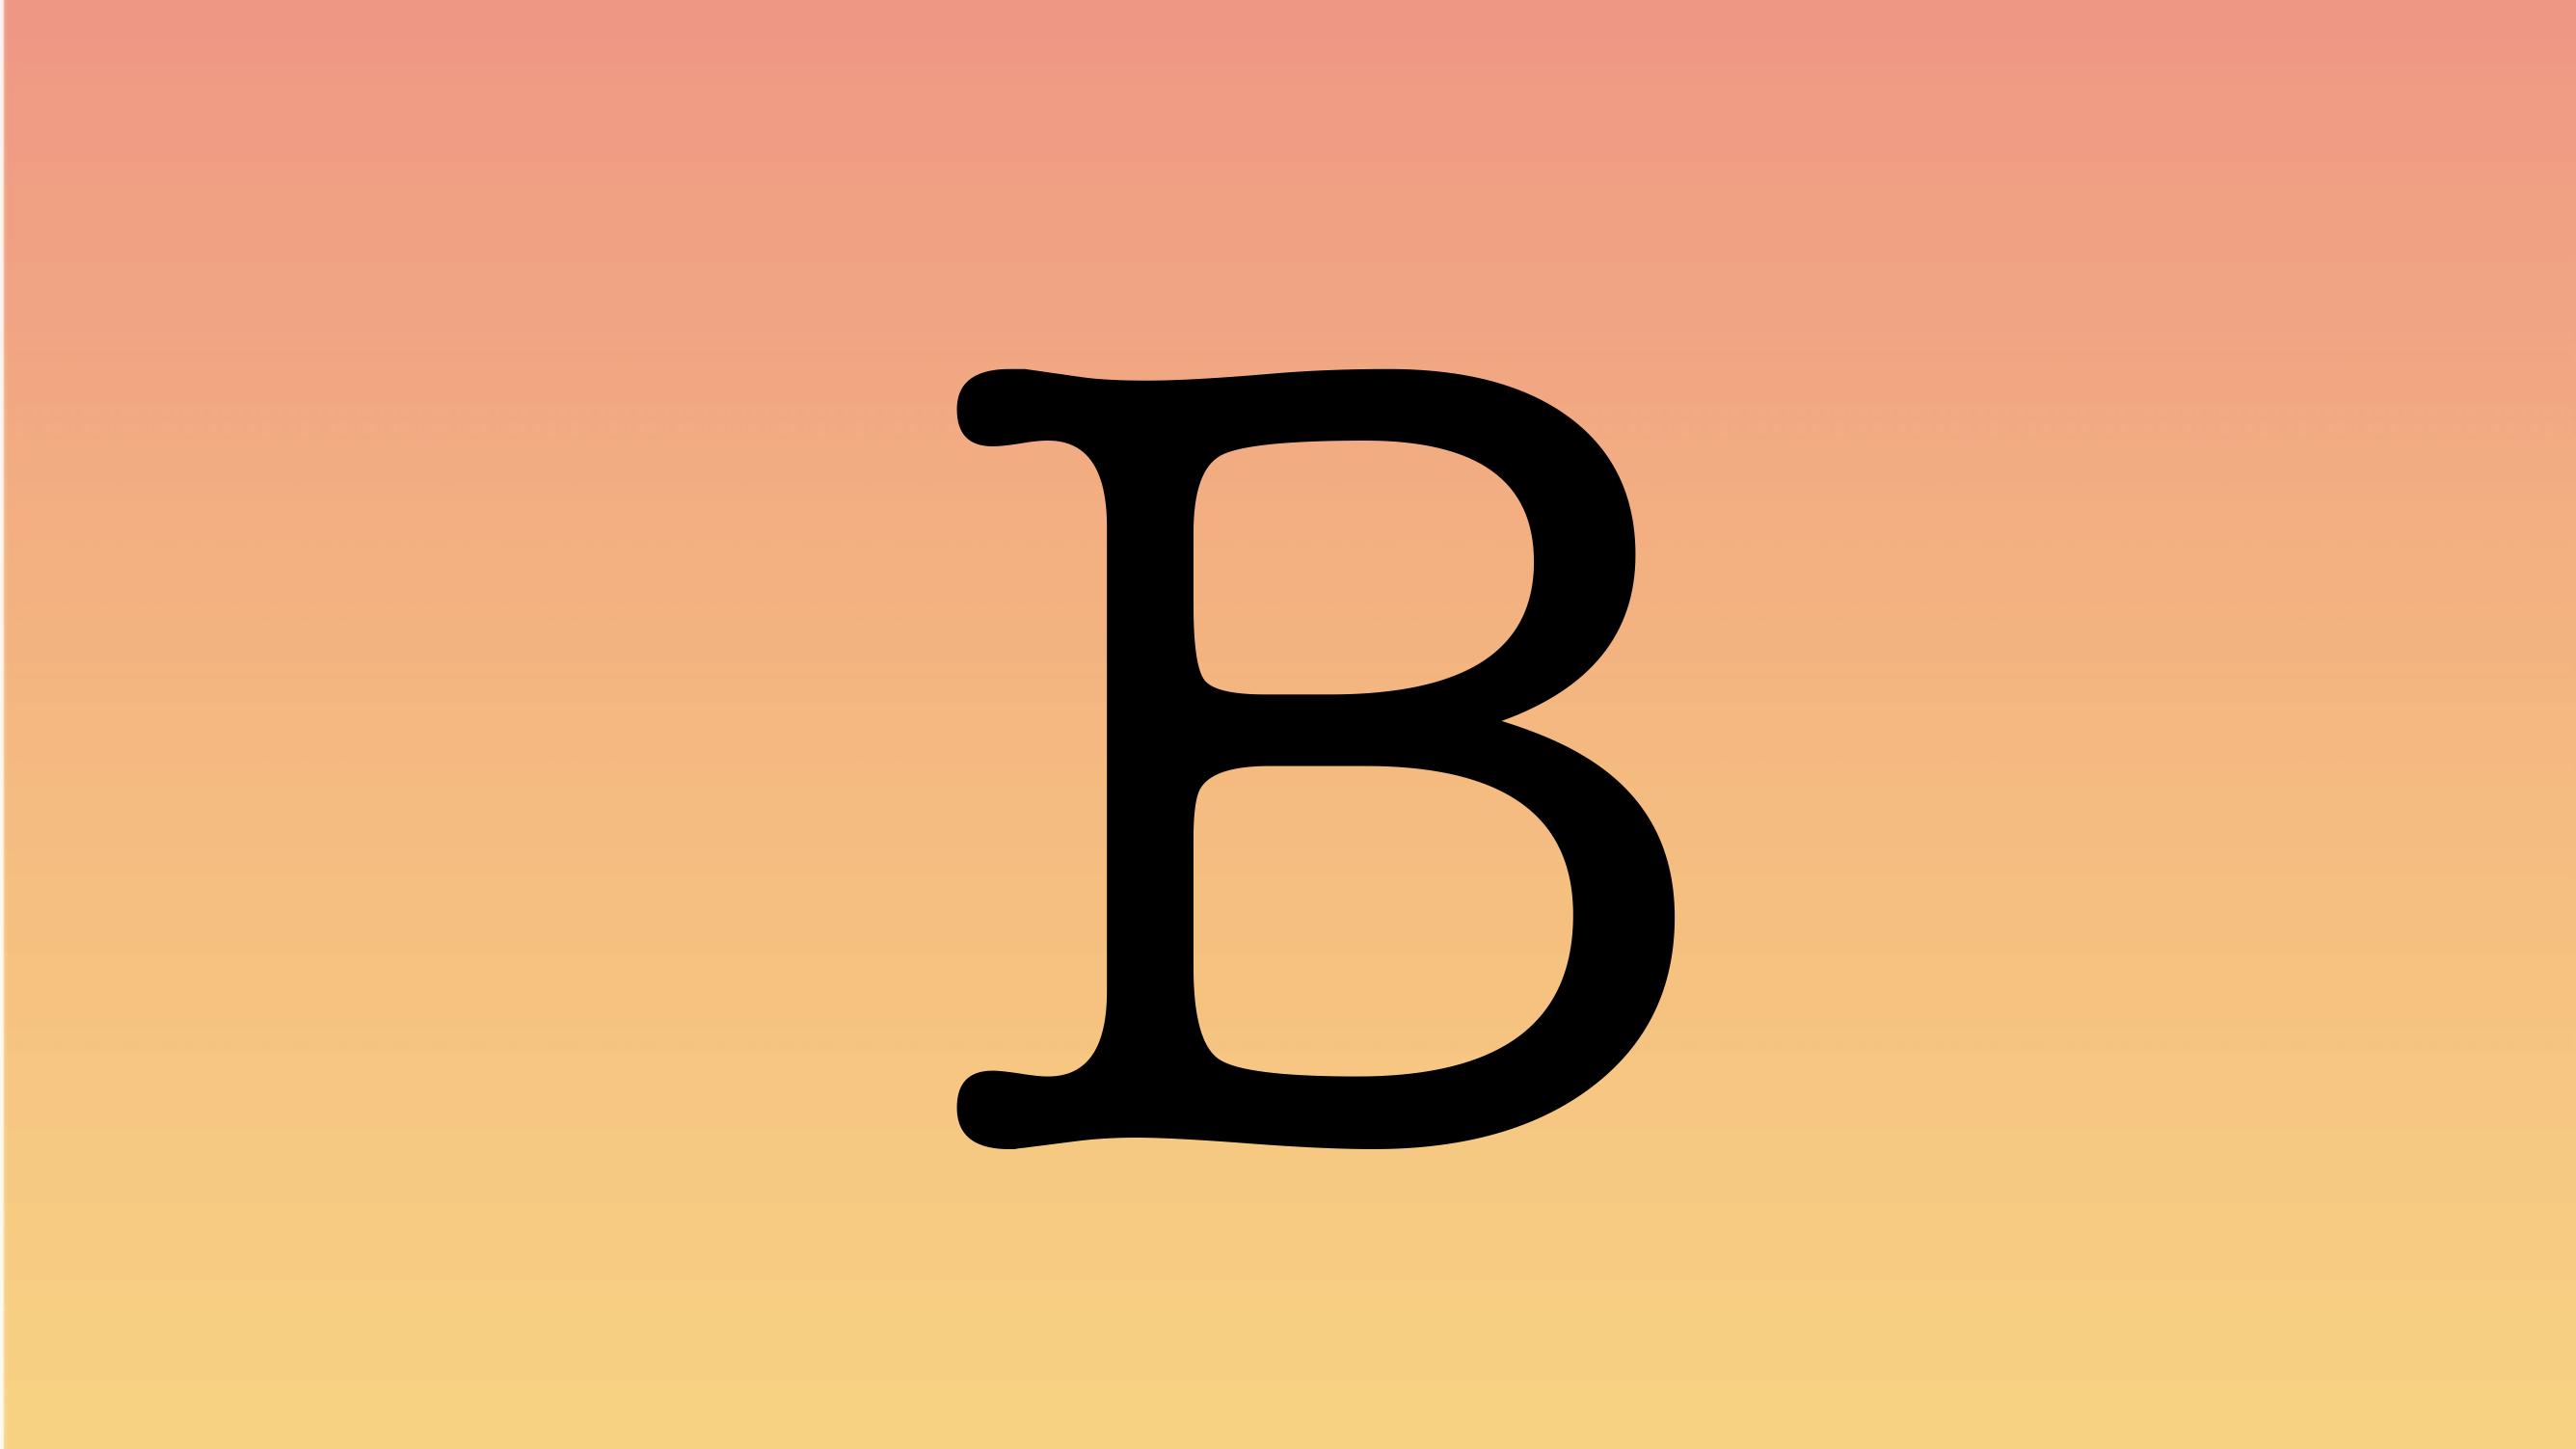 Bから始まる英語のサッカー用語【単語 & フレーズ】